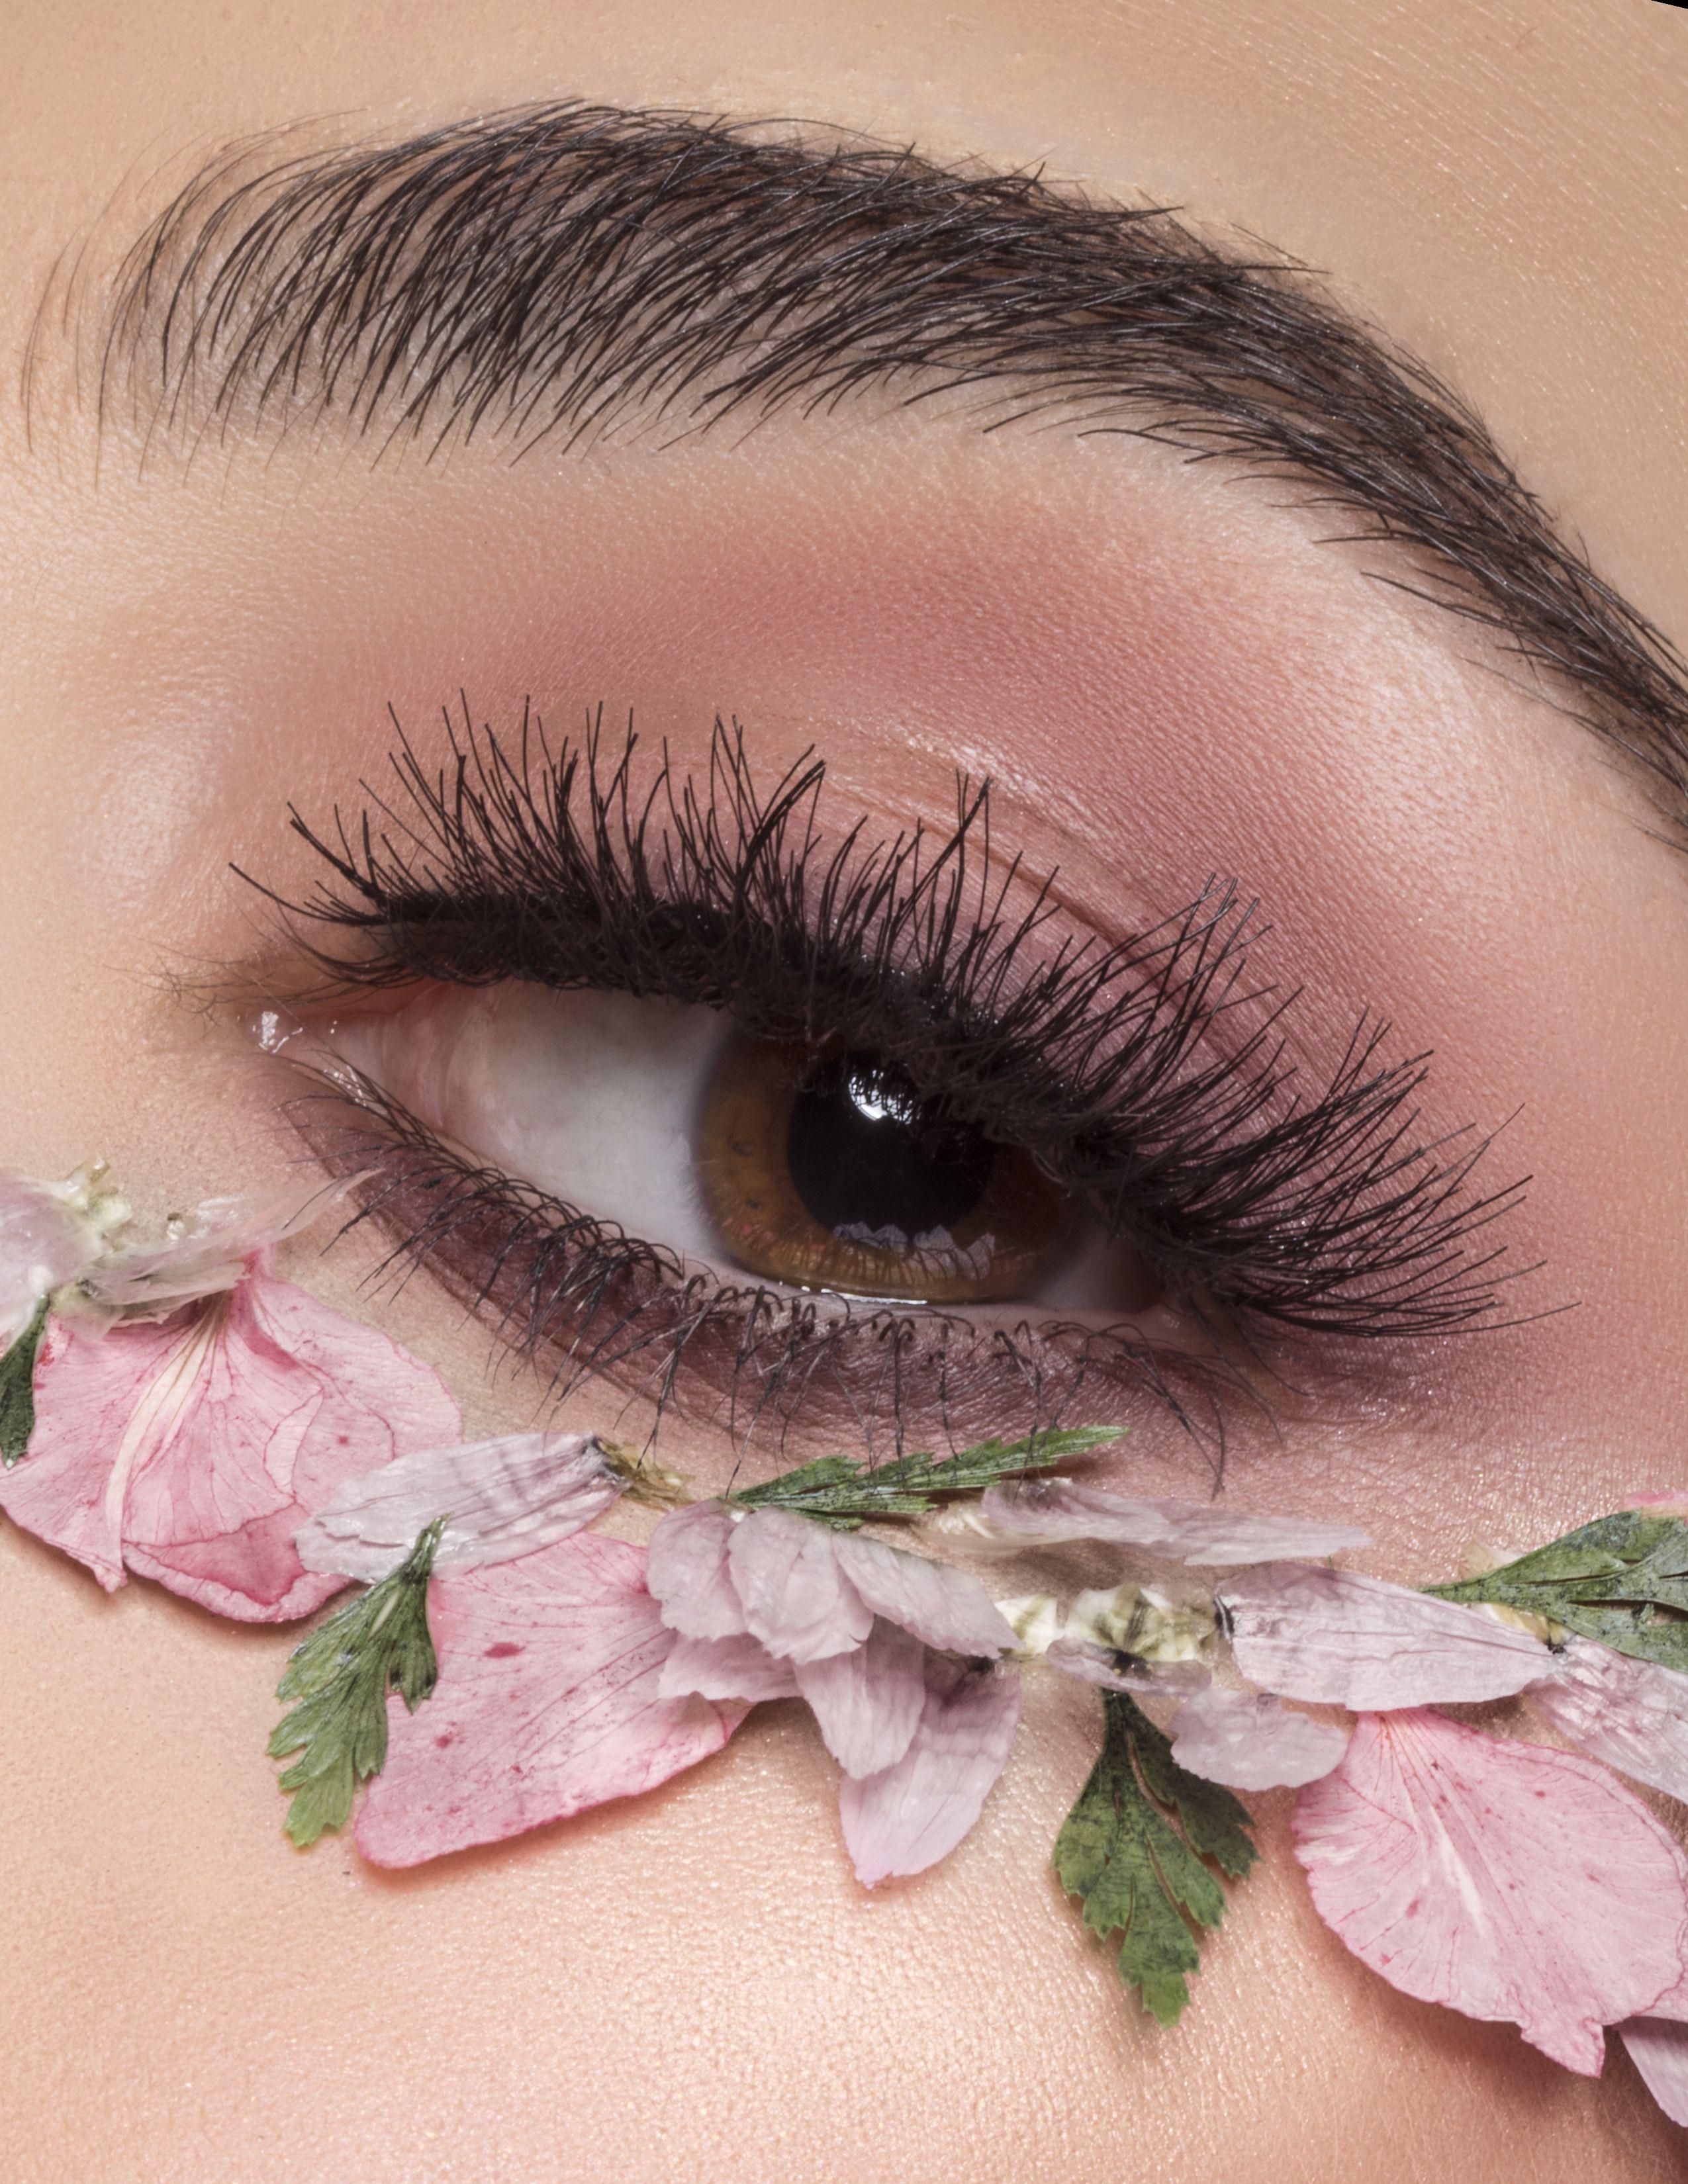 Pin by Суворова Анна on макияж Natural contact lenses